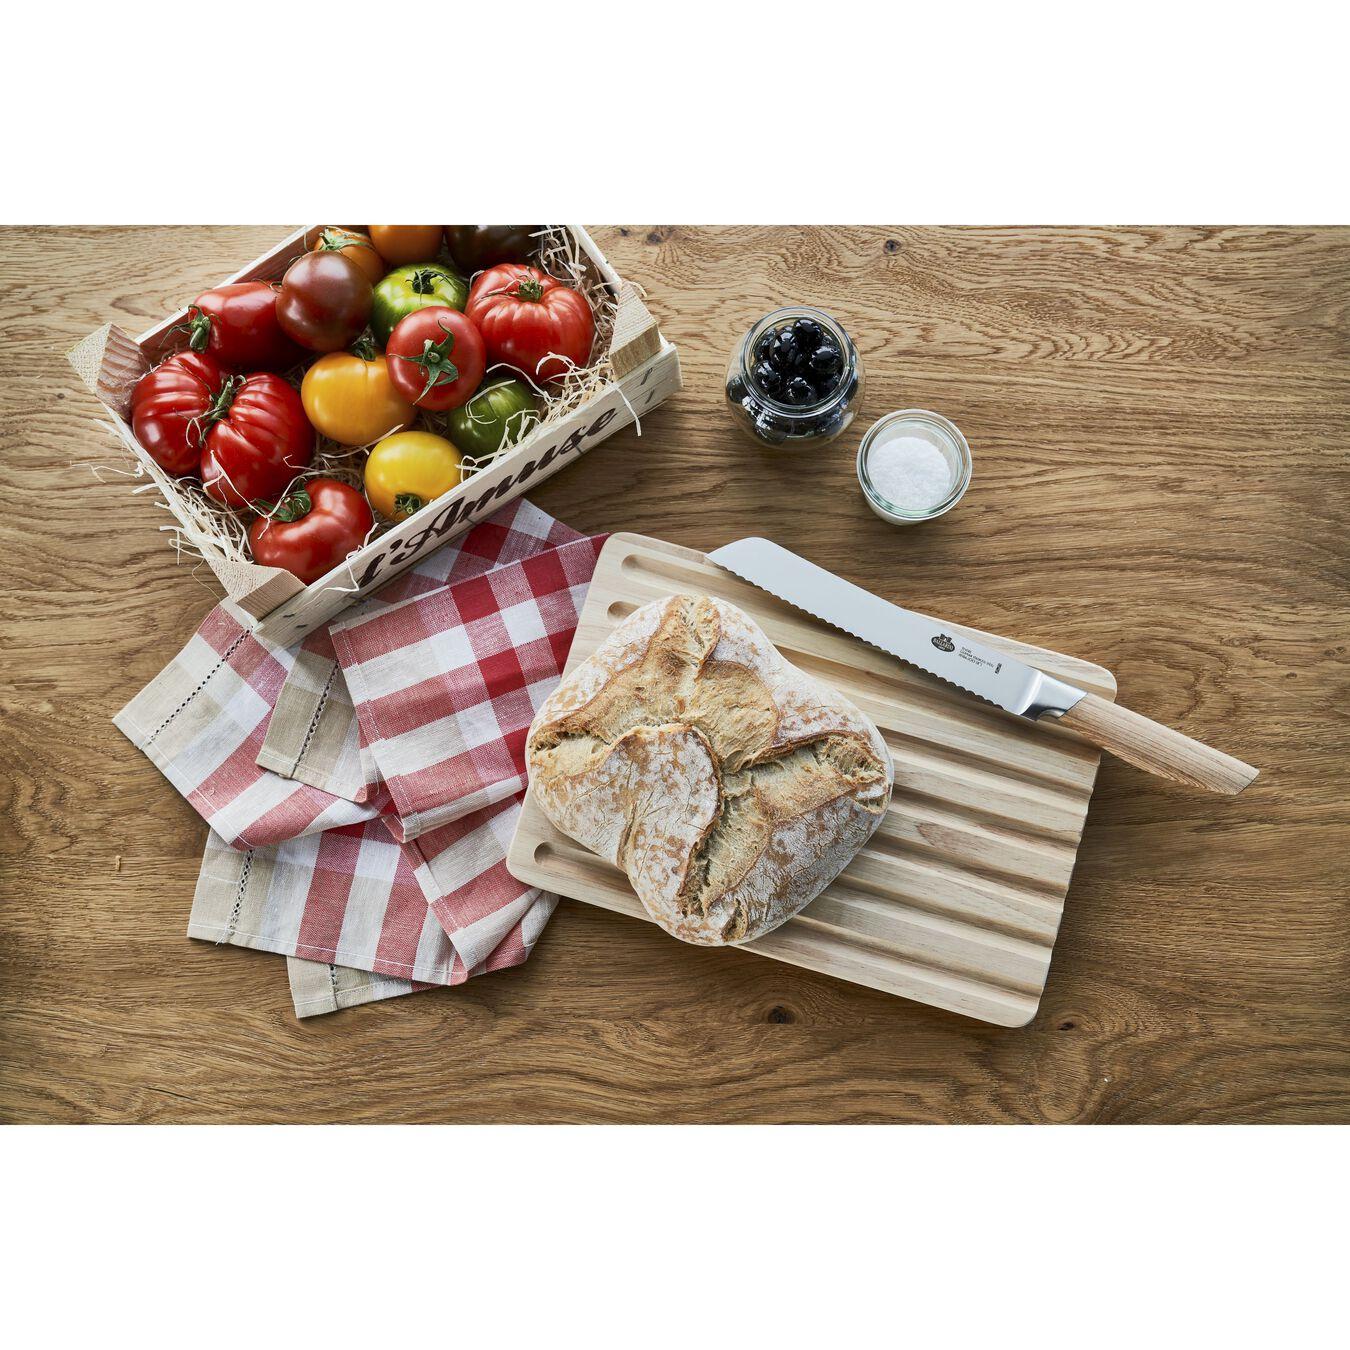 Coltello da pane seghettato - 20 cm, saldato, naturale,,large 2